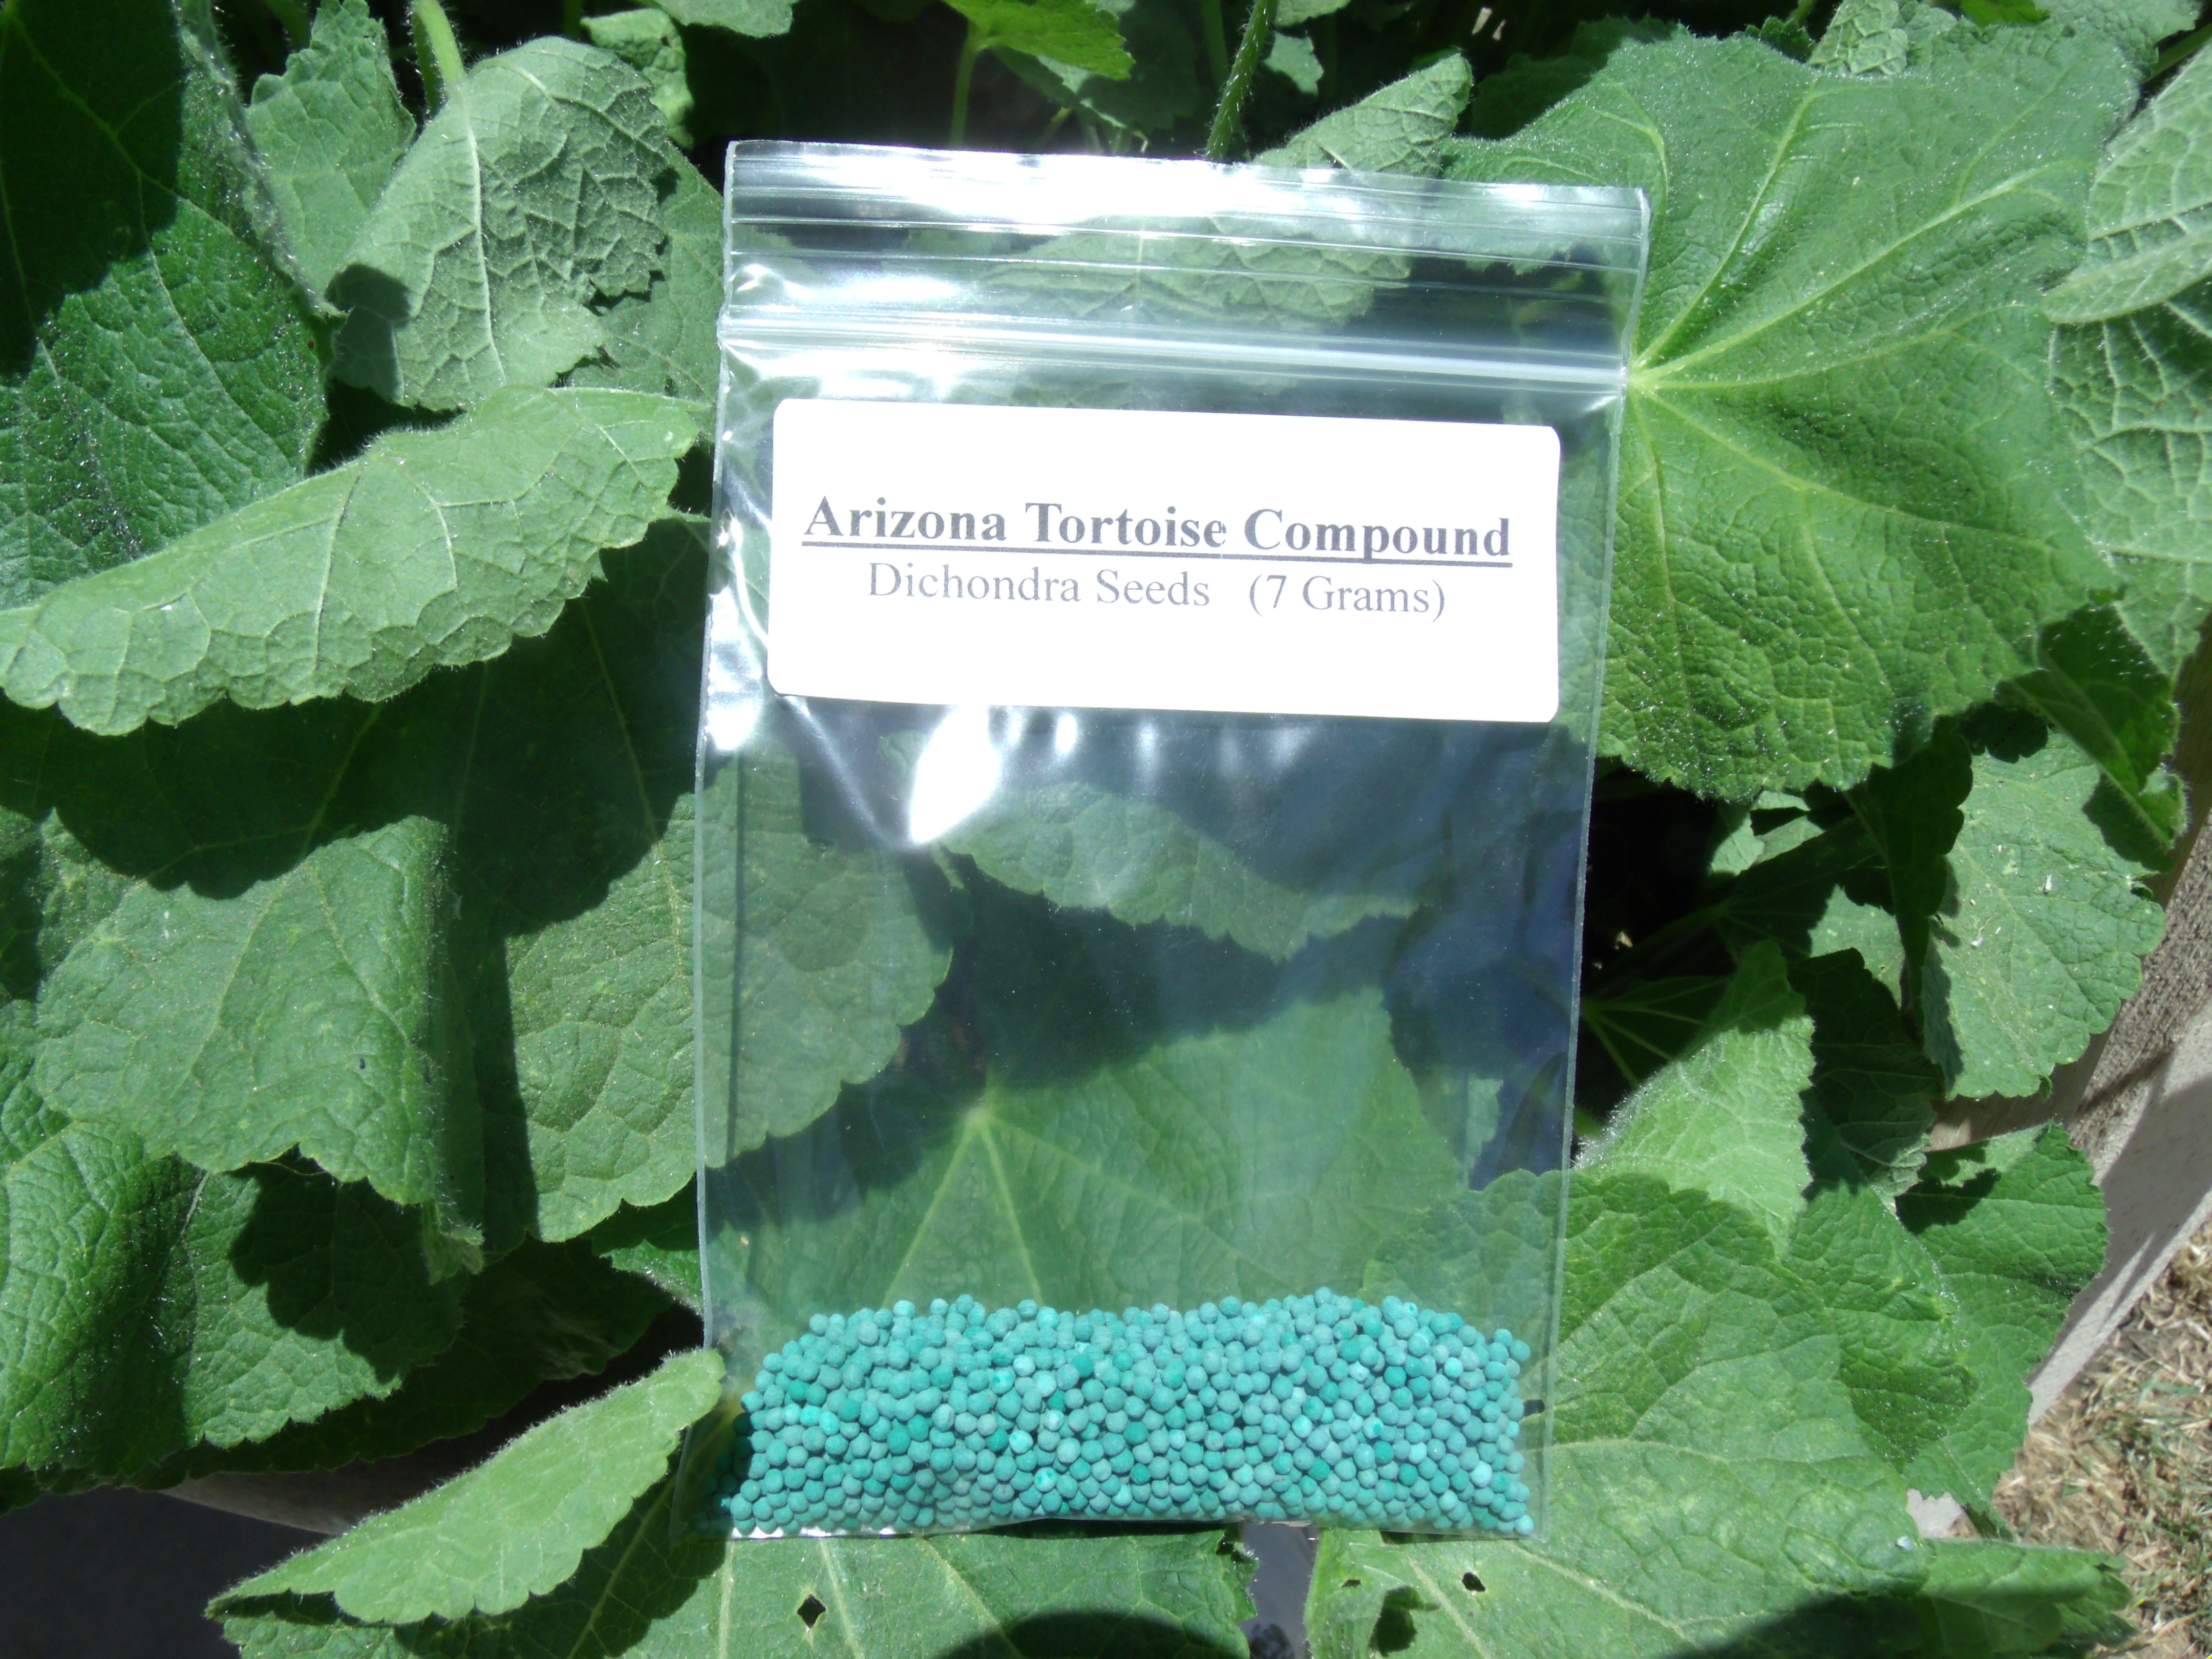 Dichondra Seed Packet